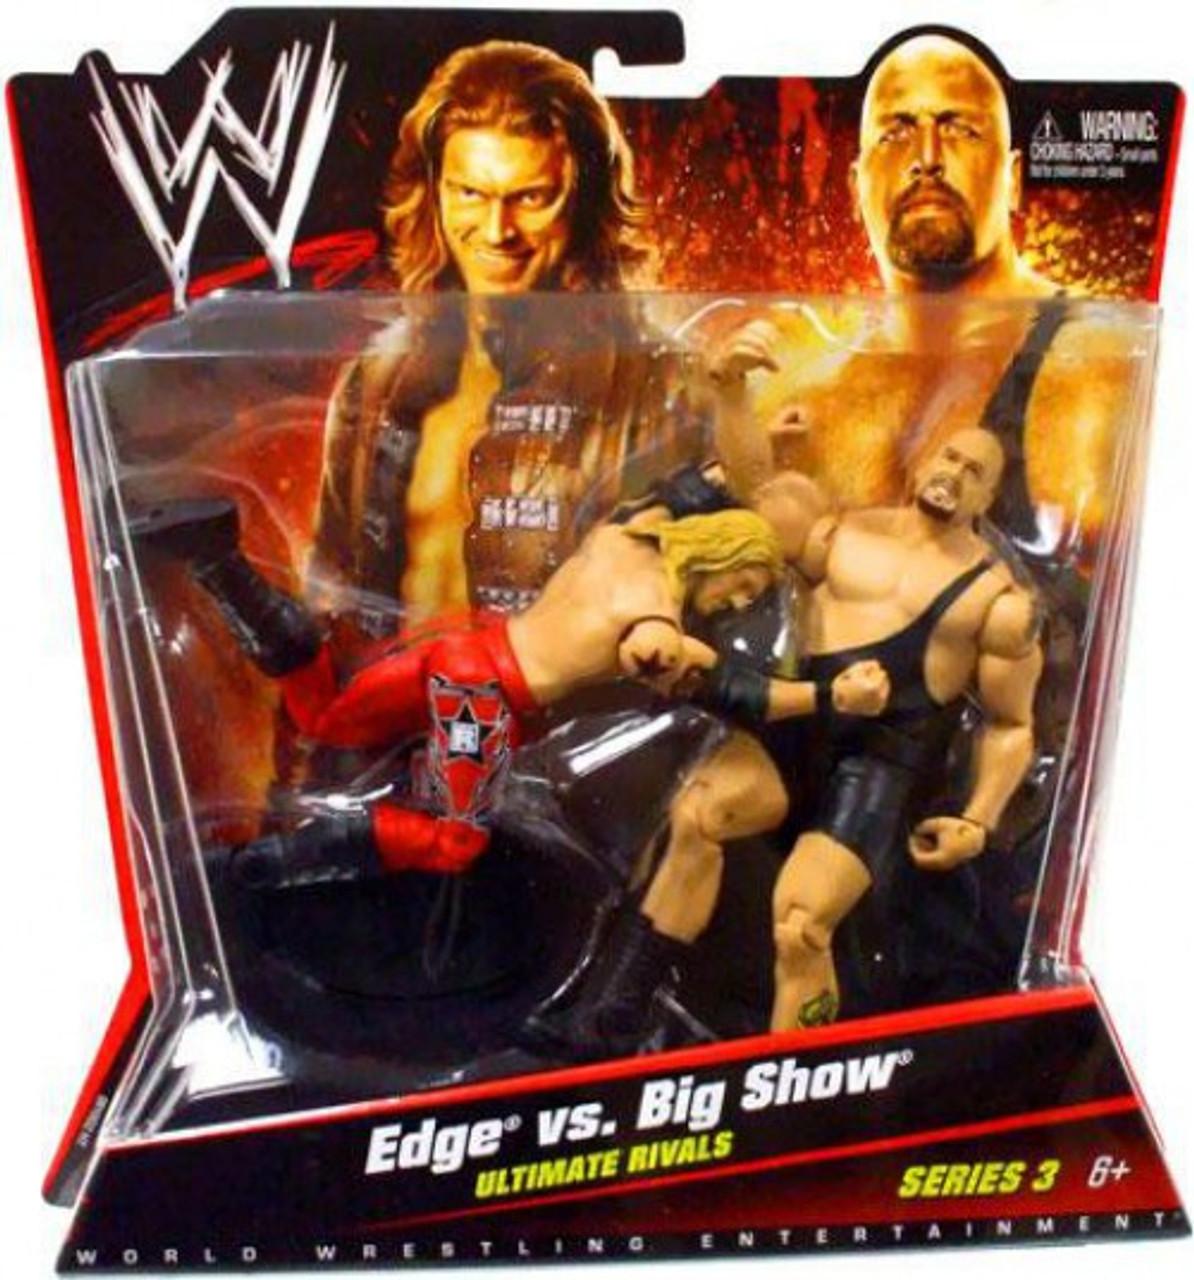 WWE WRESTLING BIG SHOW MICRO AGGRESSION NEW